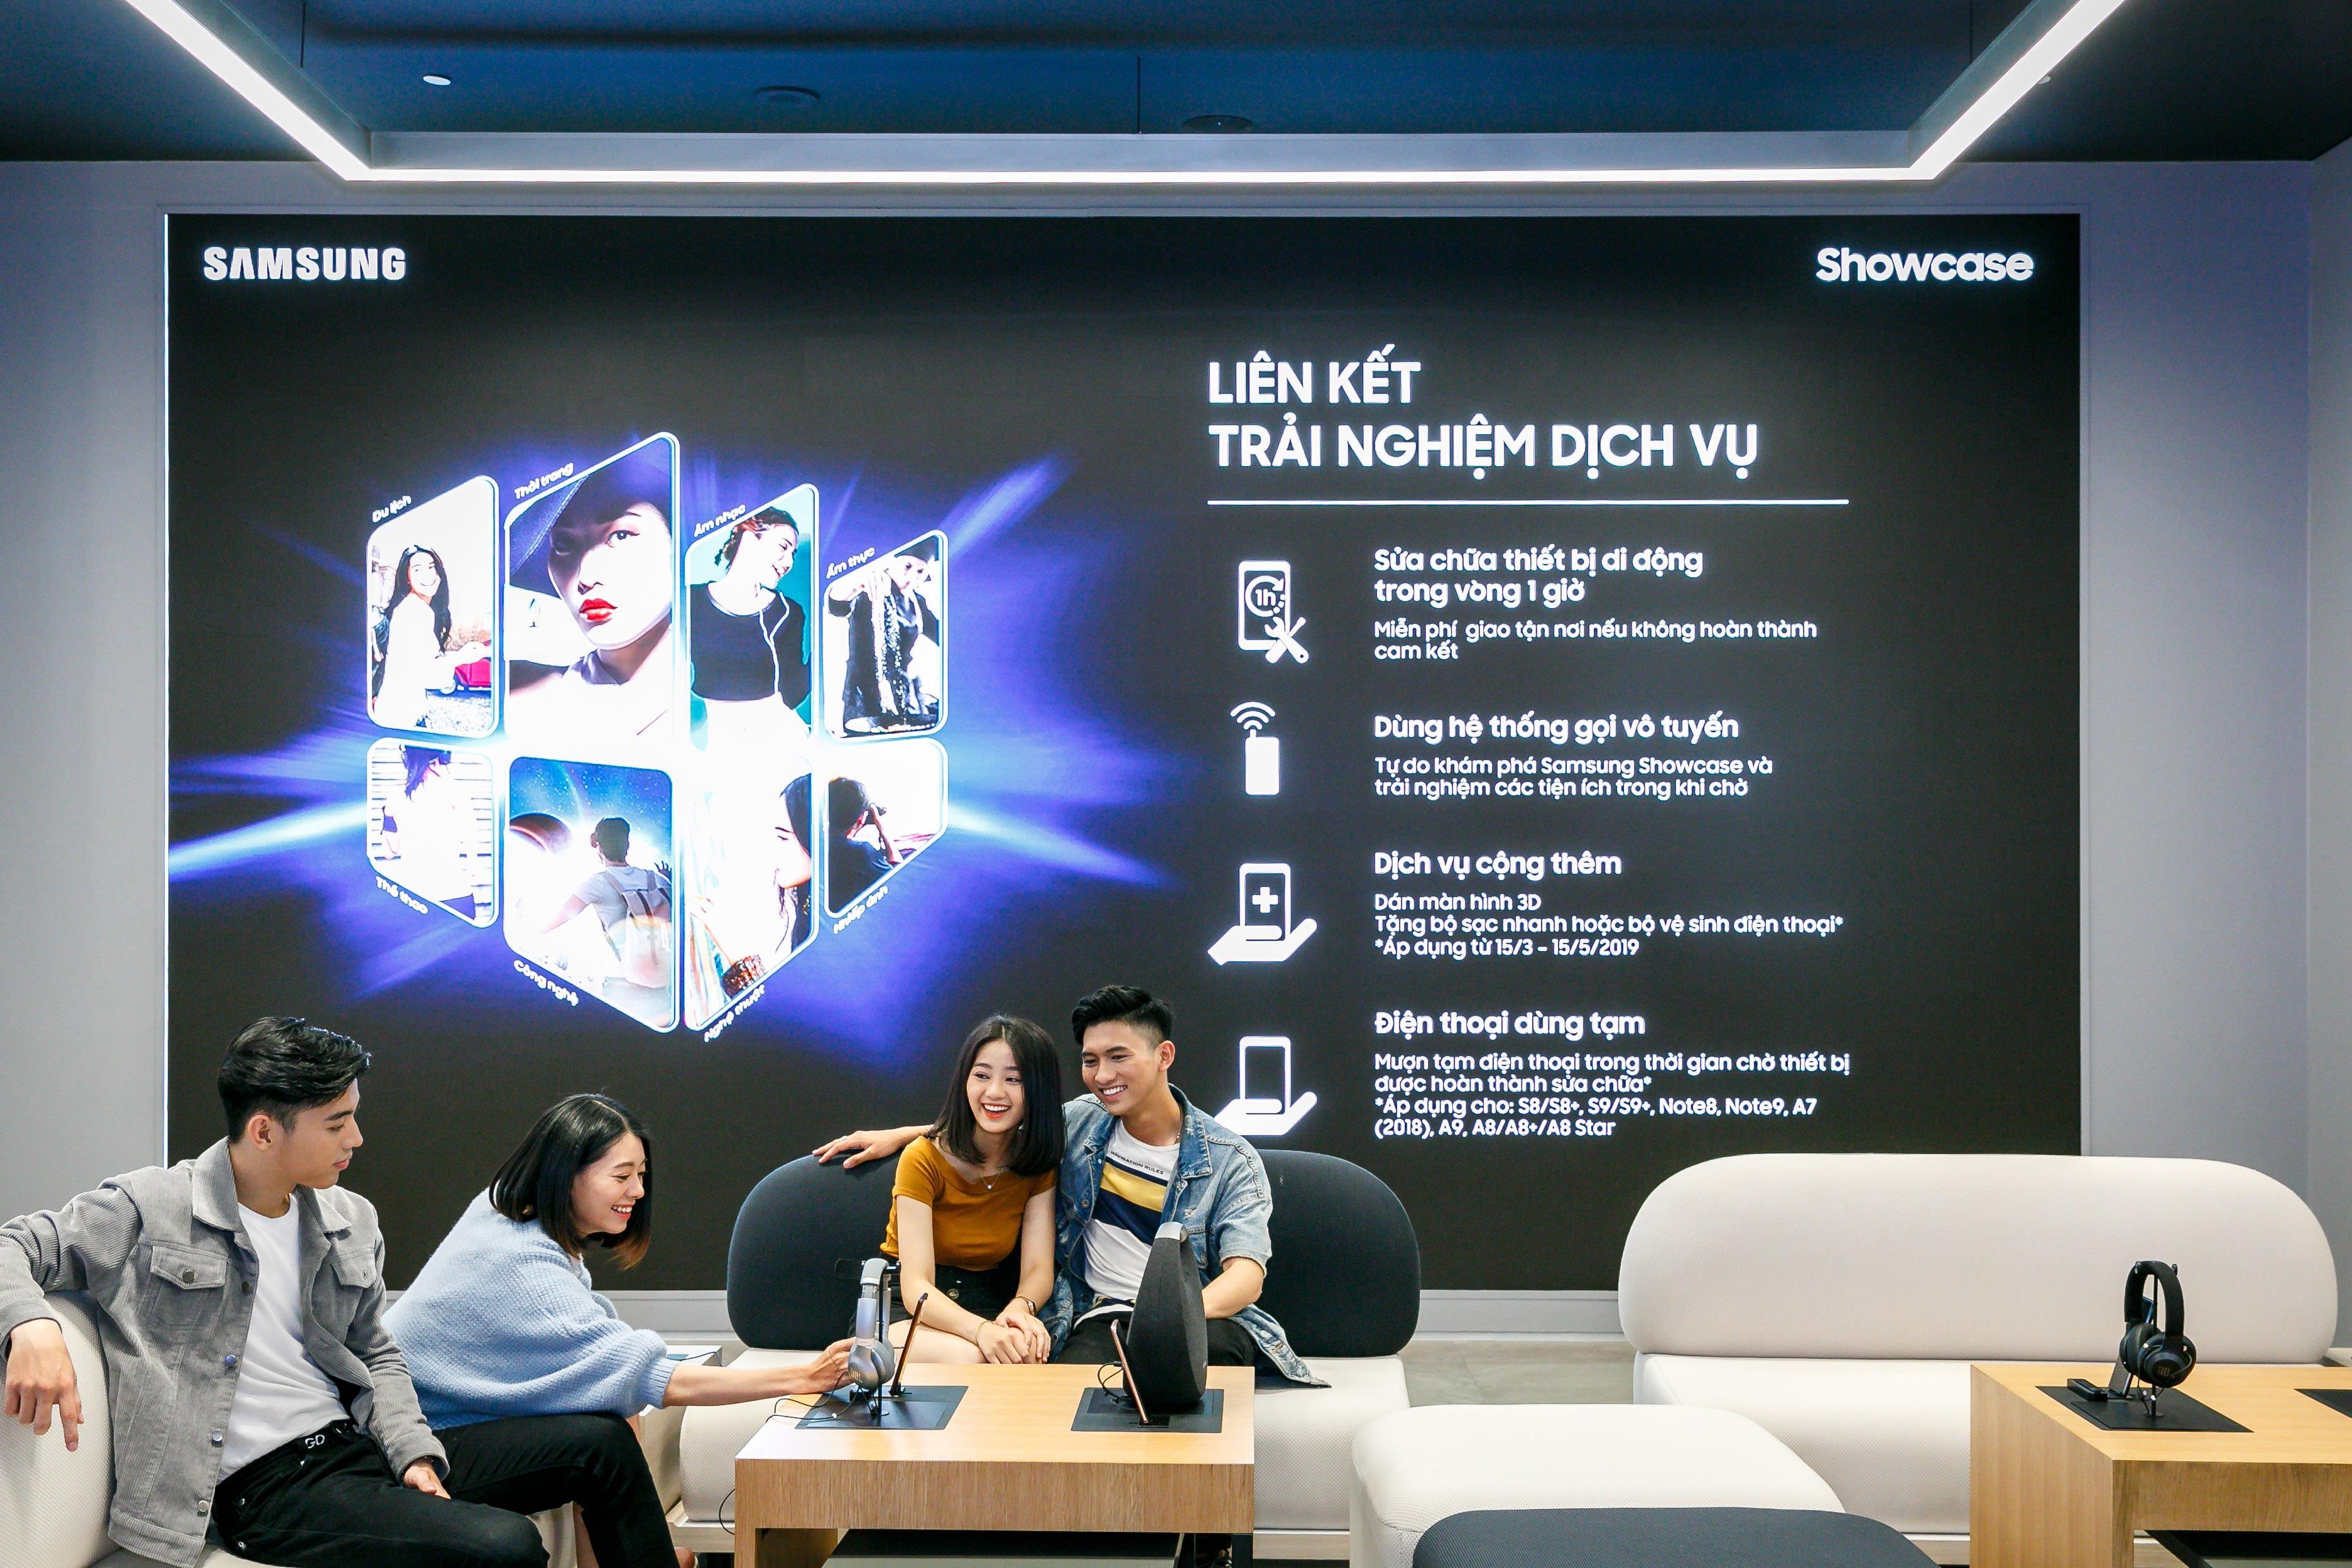 Samsung showcase anh 8